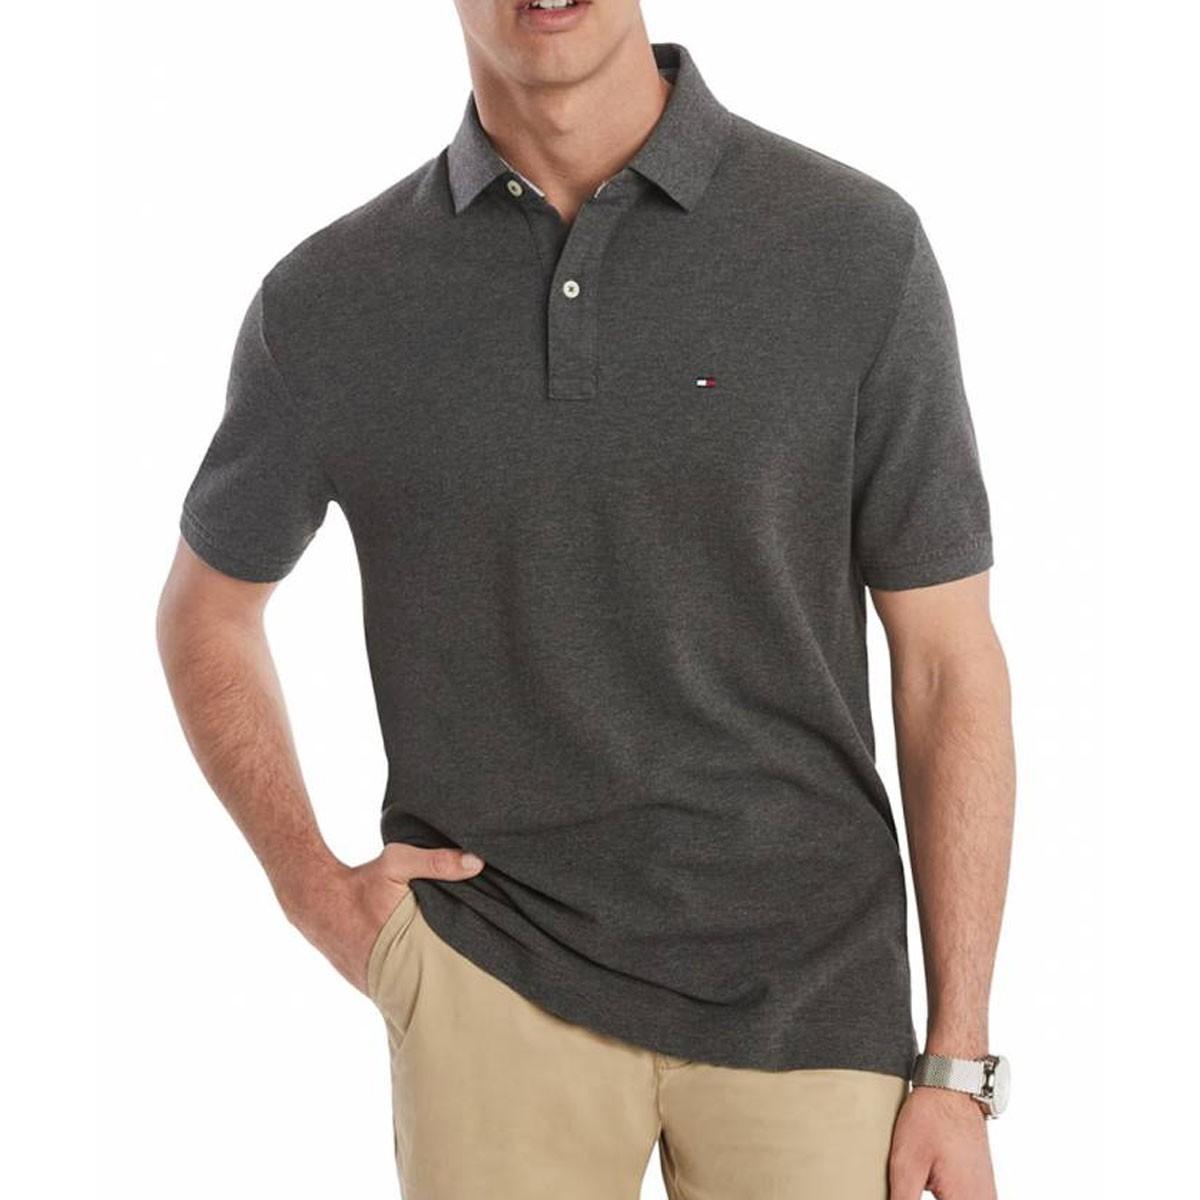 Camisa Polo Tommy Hilfiger Regular Cinza Chumbo